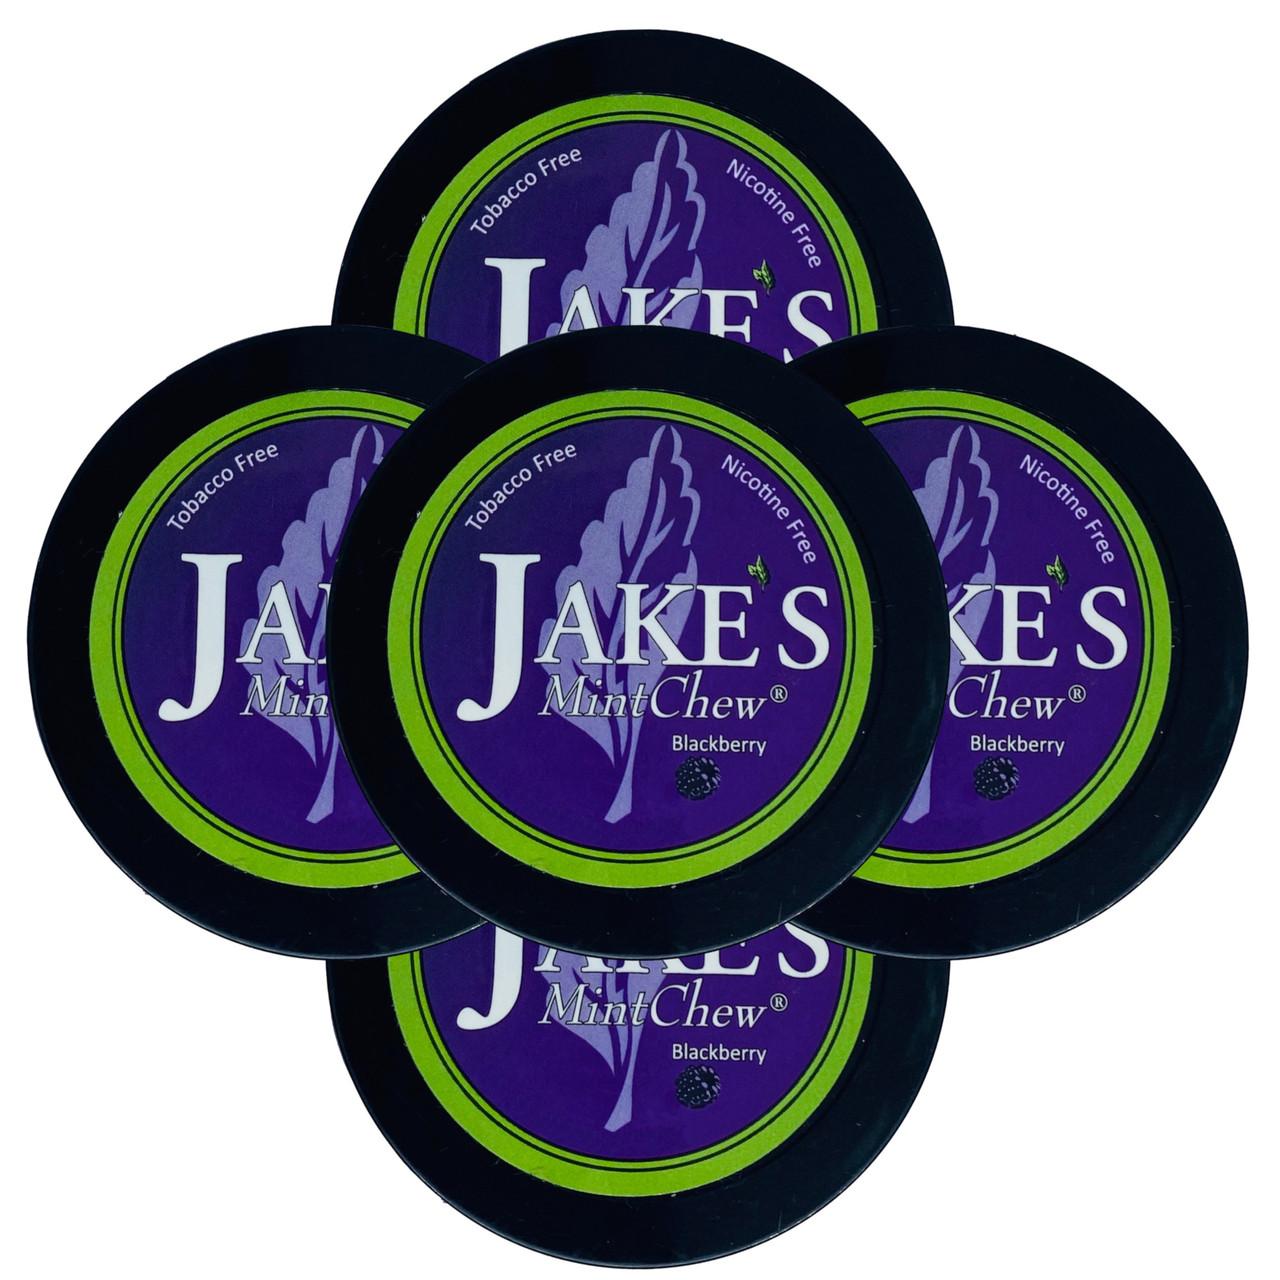 Jake's Mint Chew Blackberry 5 Cans